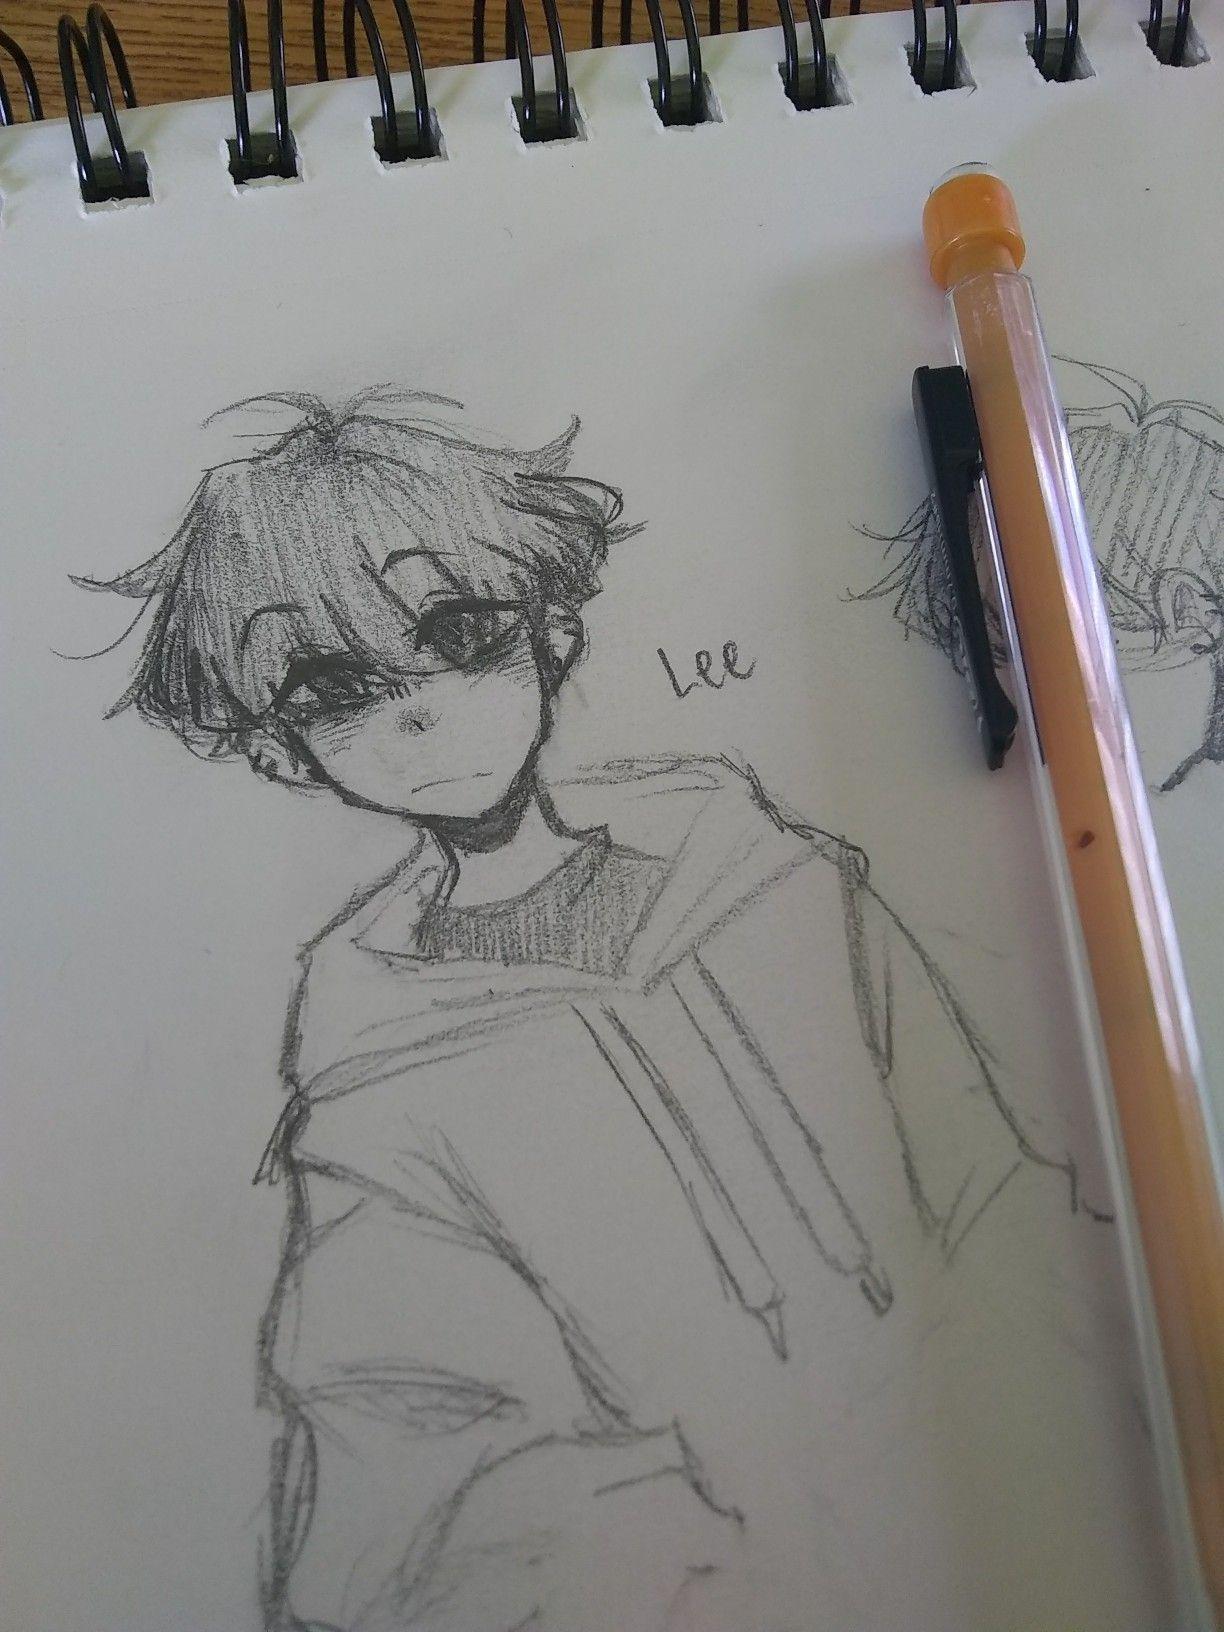 My Oc My Insta Is Geebogigi Cartoon Art Styles Sketches Art Inspiration